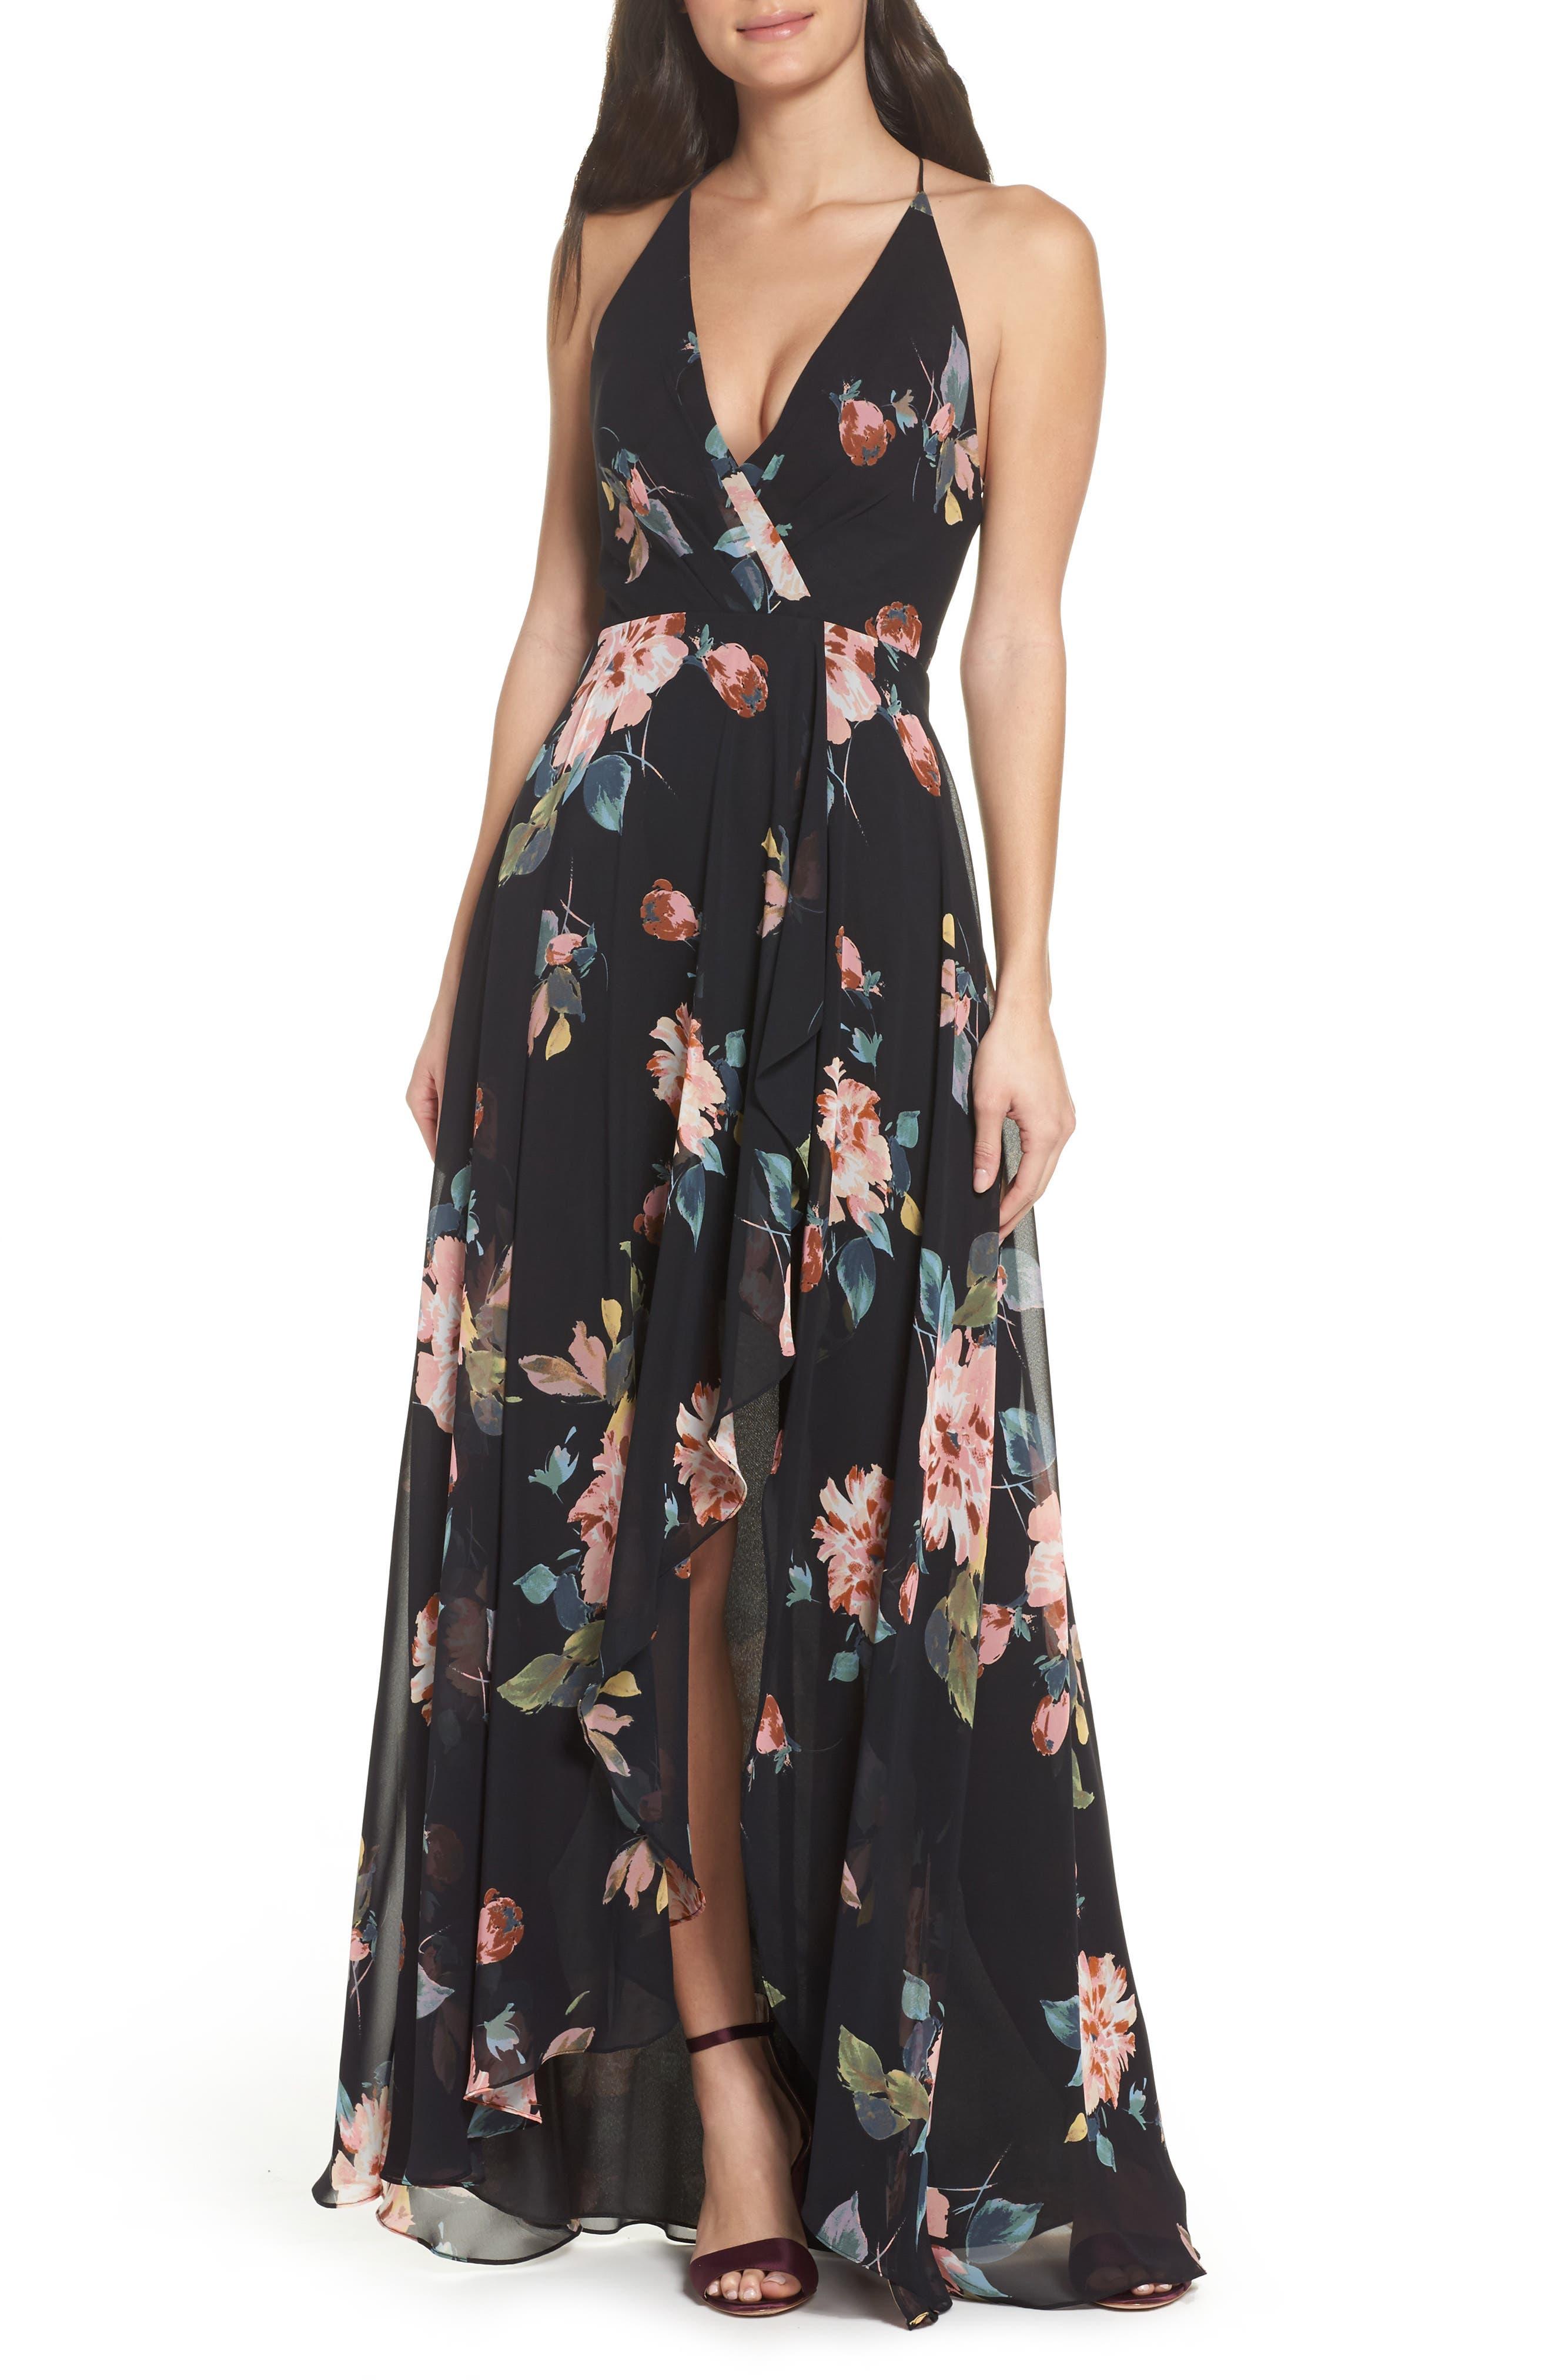 JENNY YOO Farrah Halter Gown in Black Multi